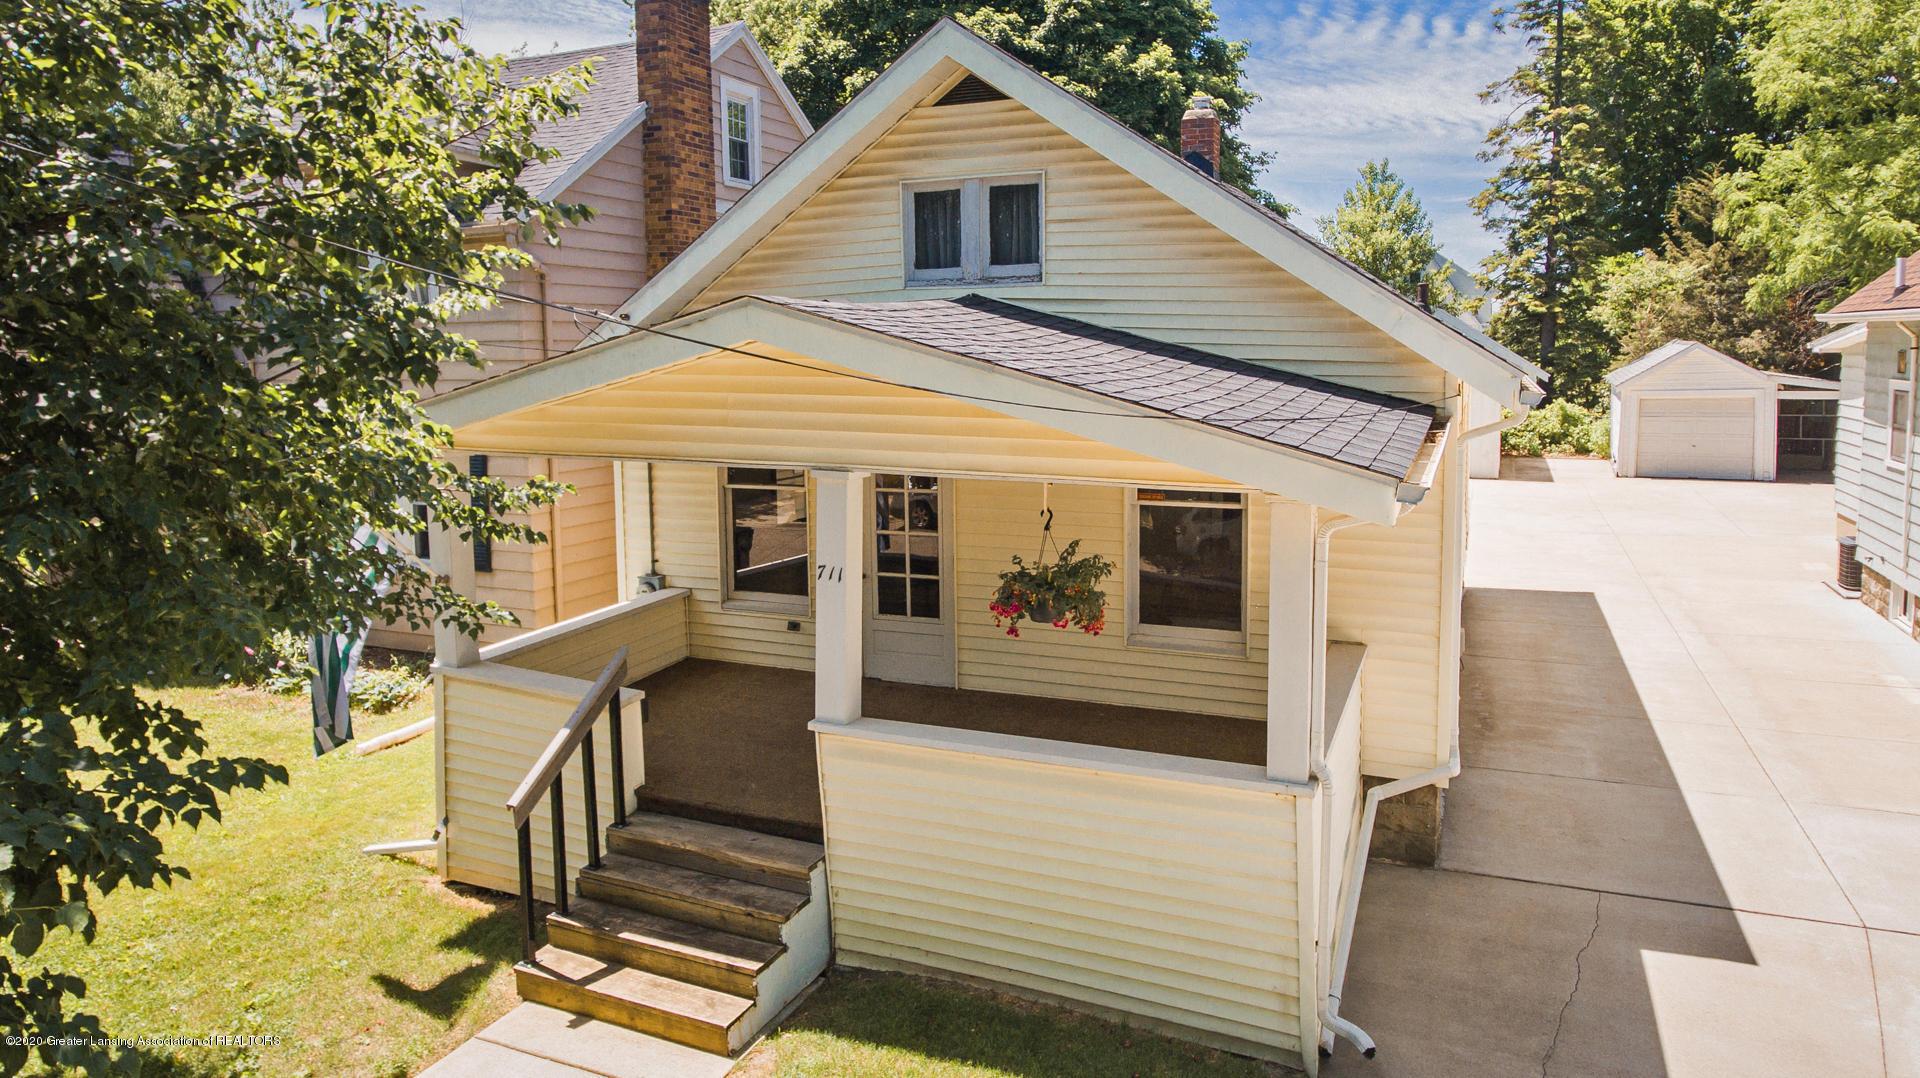 711 N Magnolia Ave - 711 N. Magnolia - 1